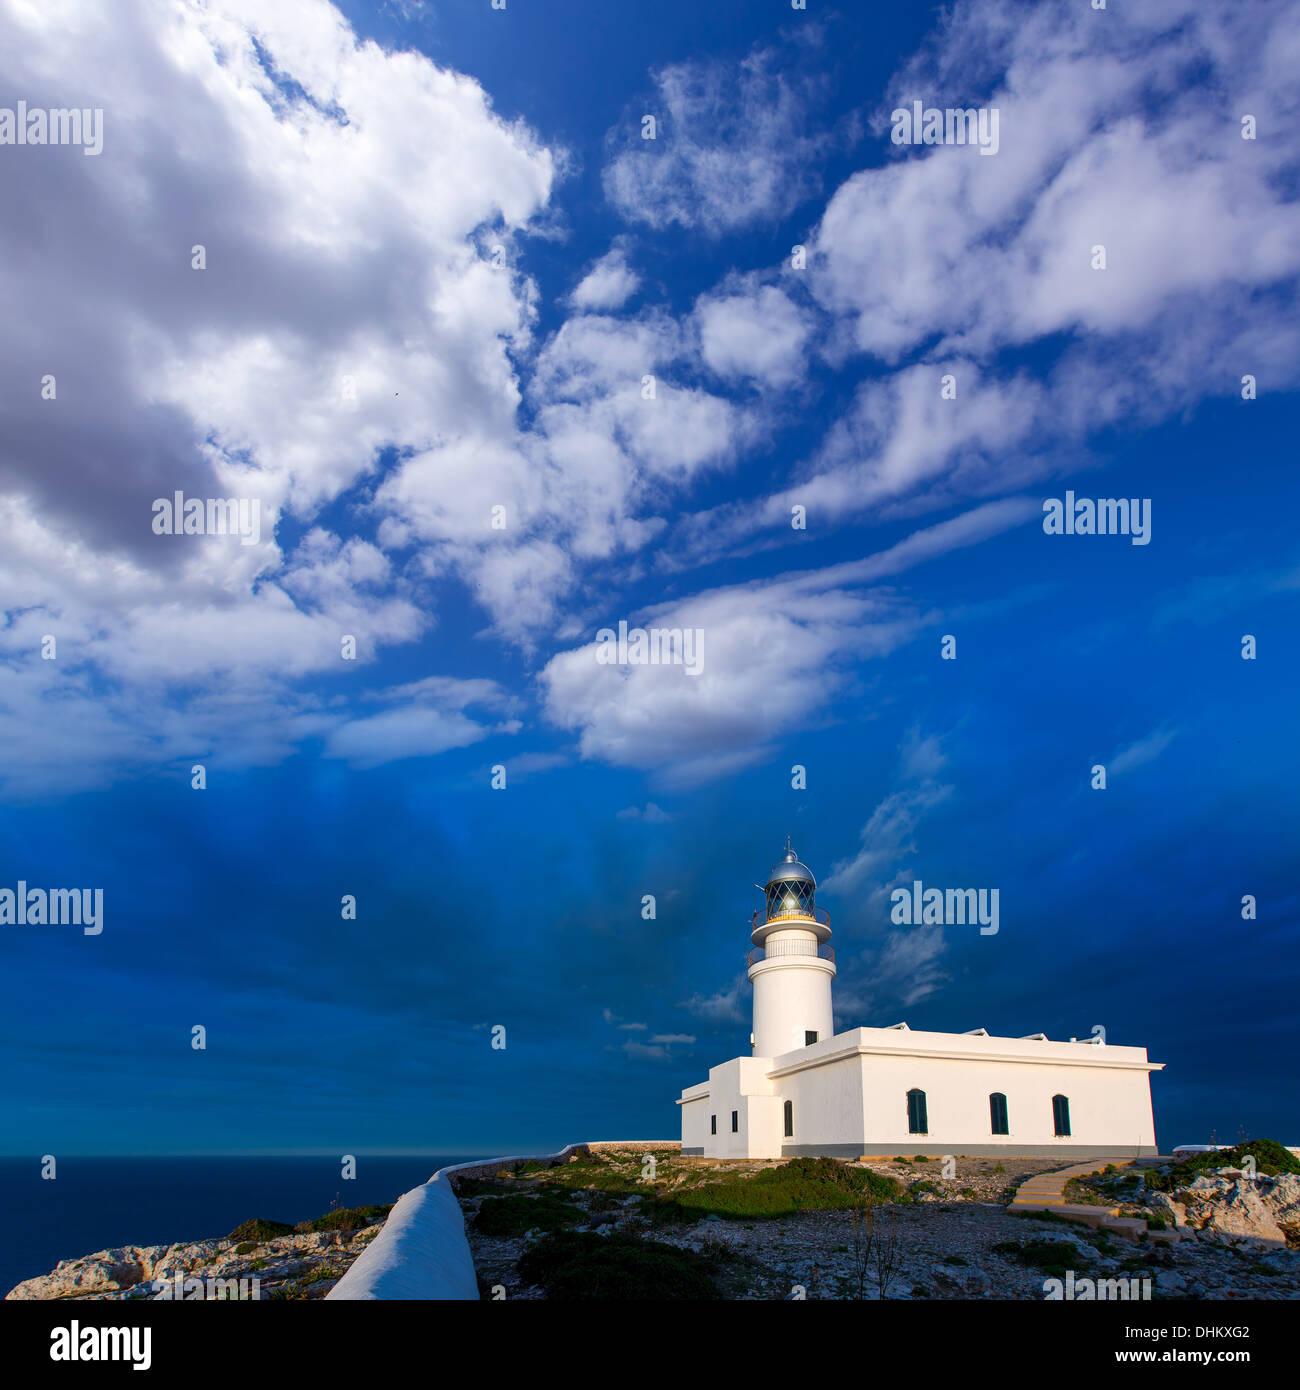 Menorca sunset in Faro Far de Caballeria Lighthouse at Balearic Islands es Mercadal - Stock Image